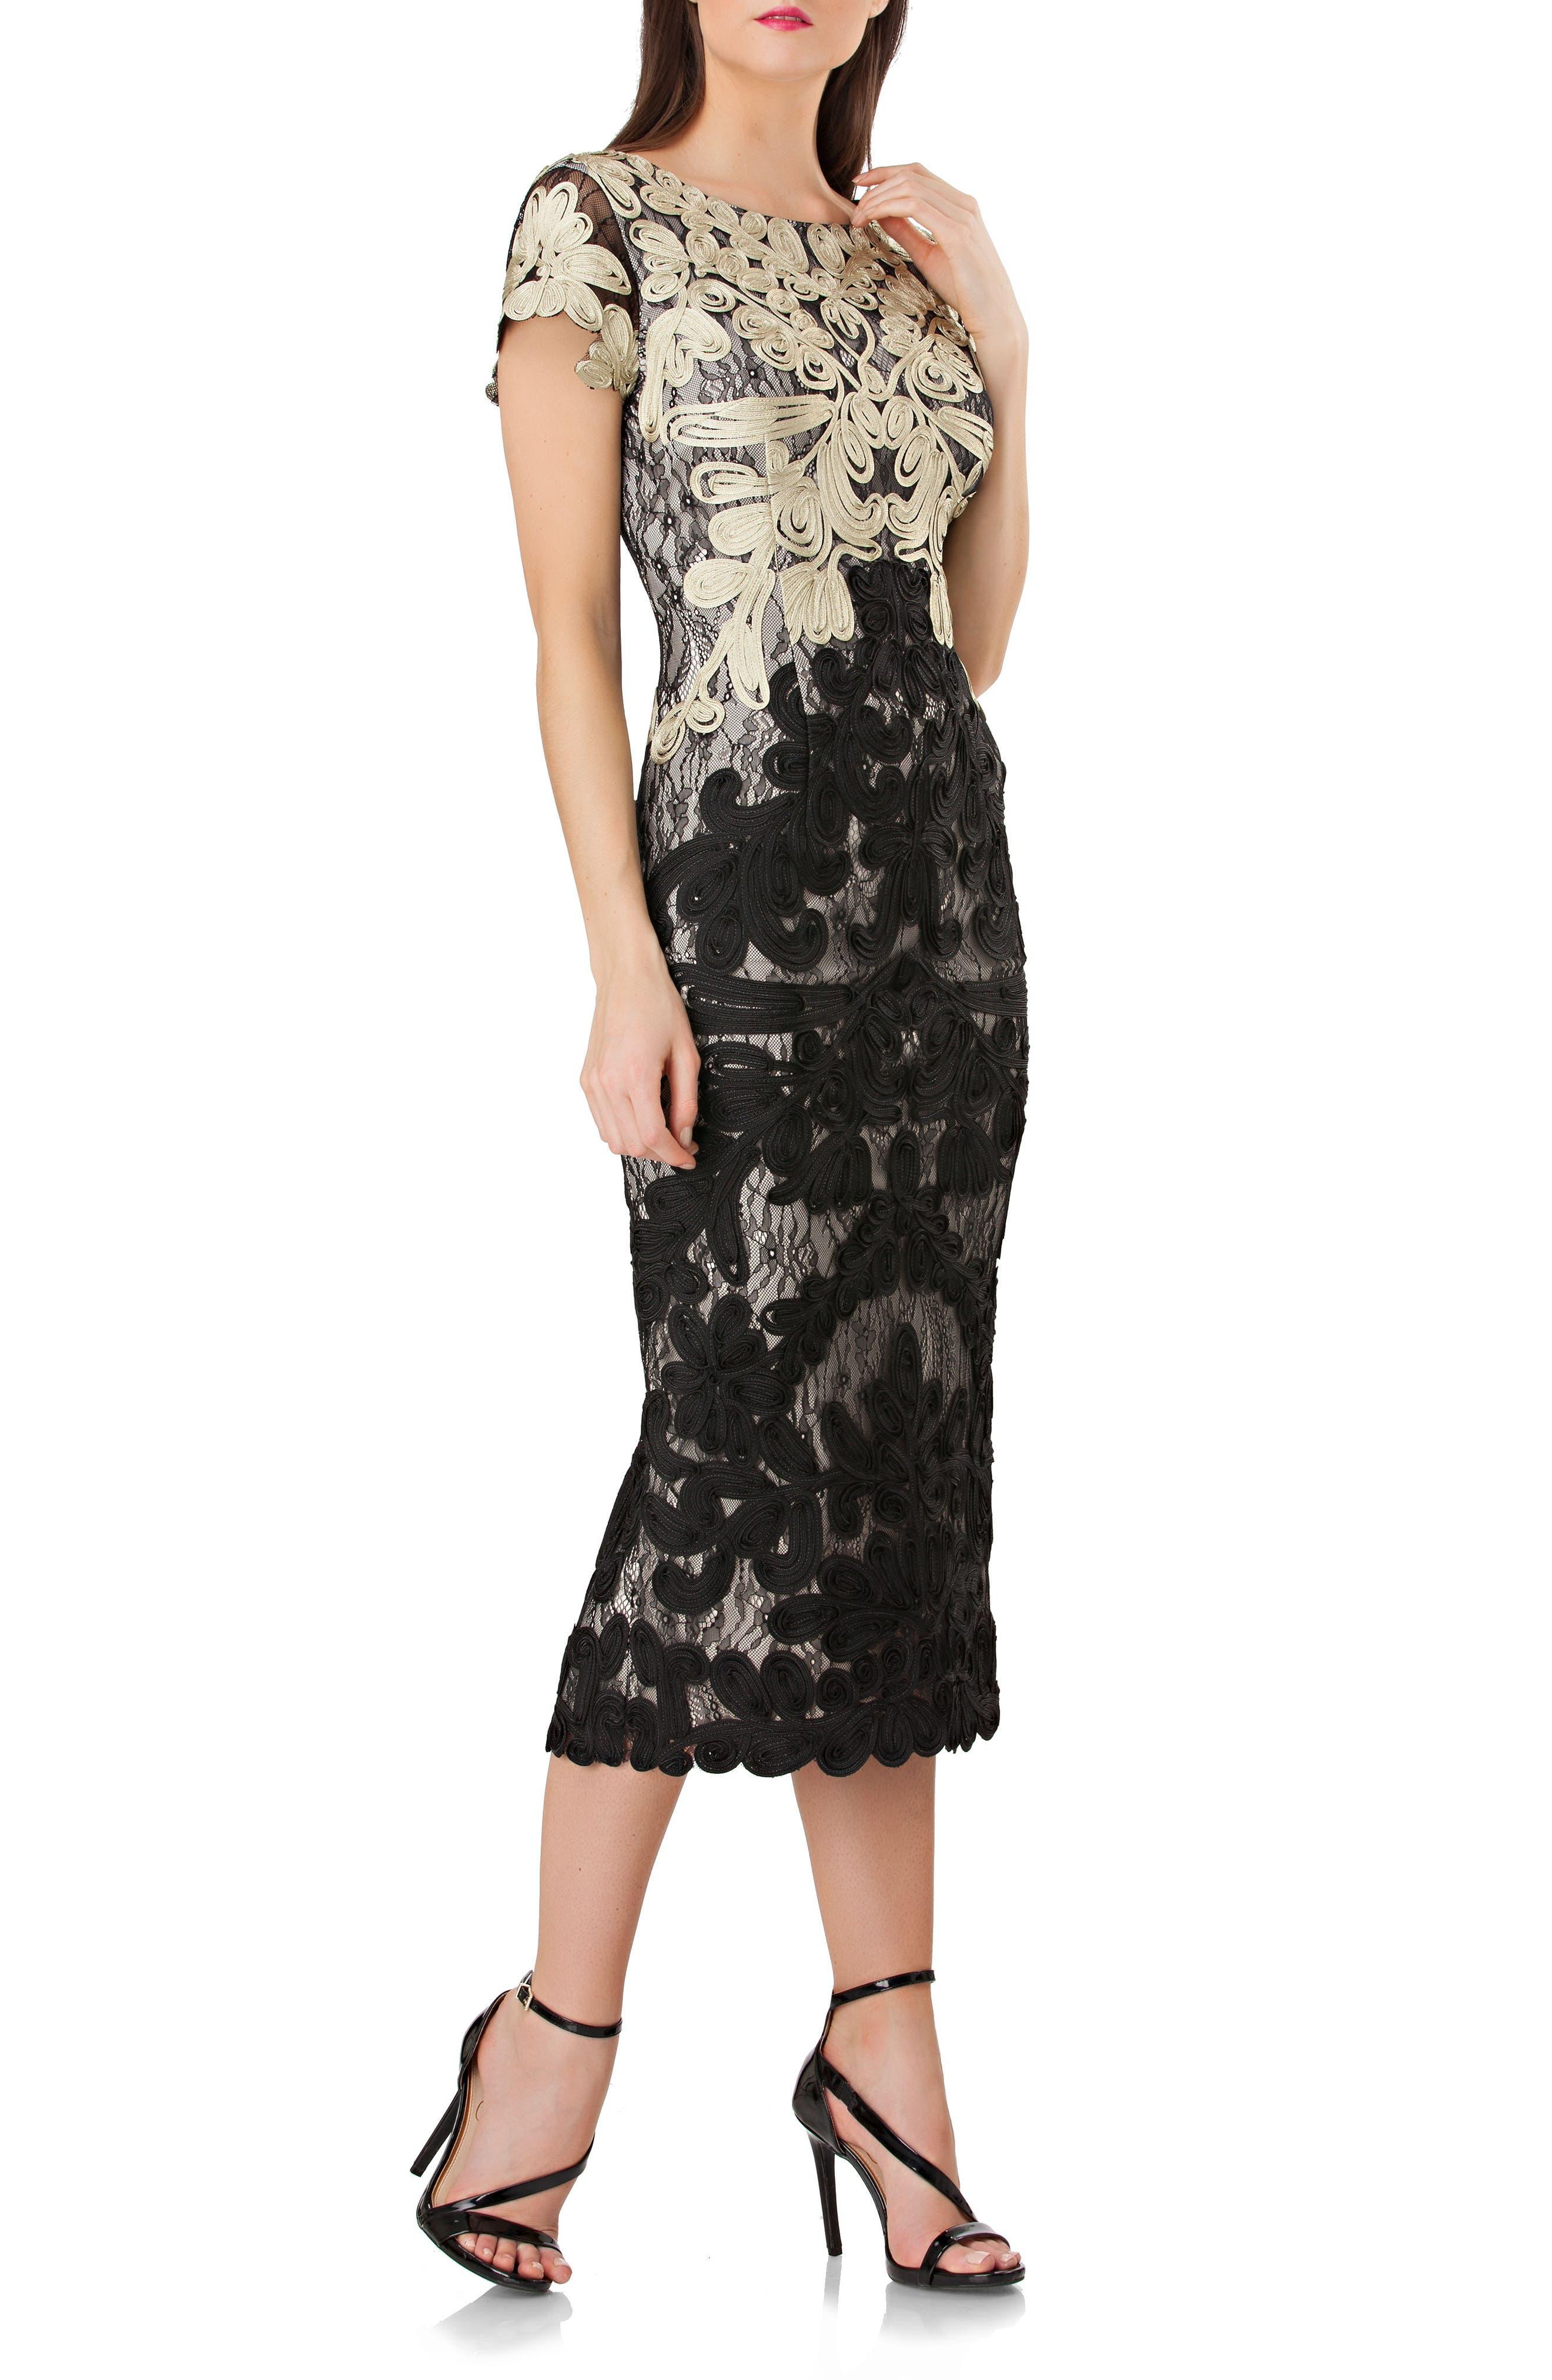 Copper Knee Length Dresses